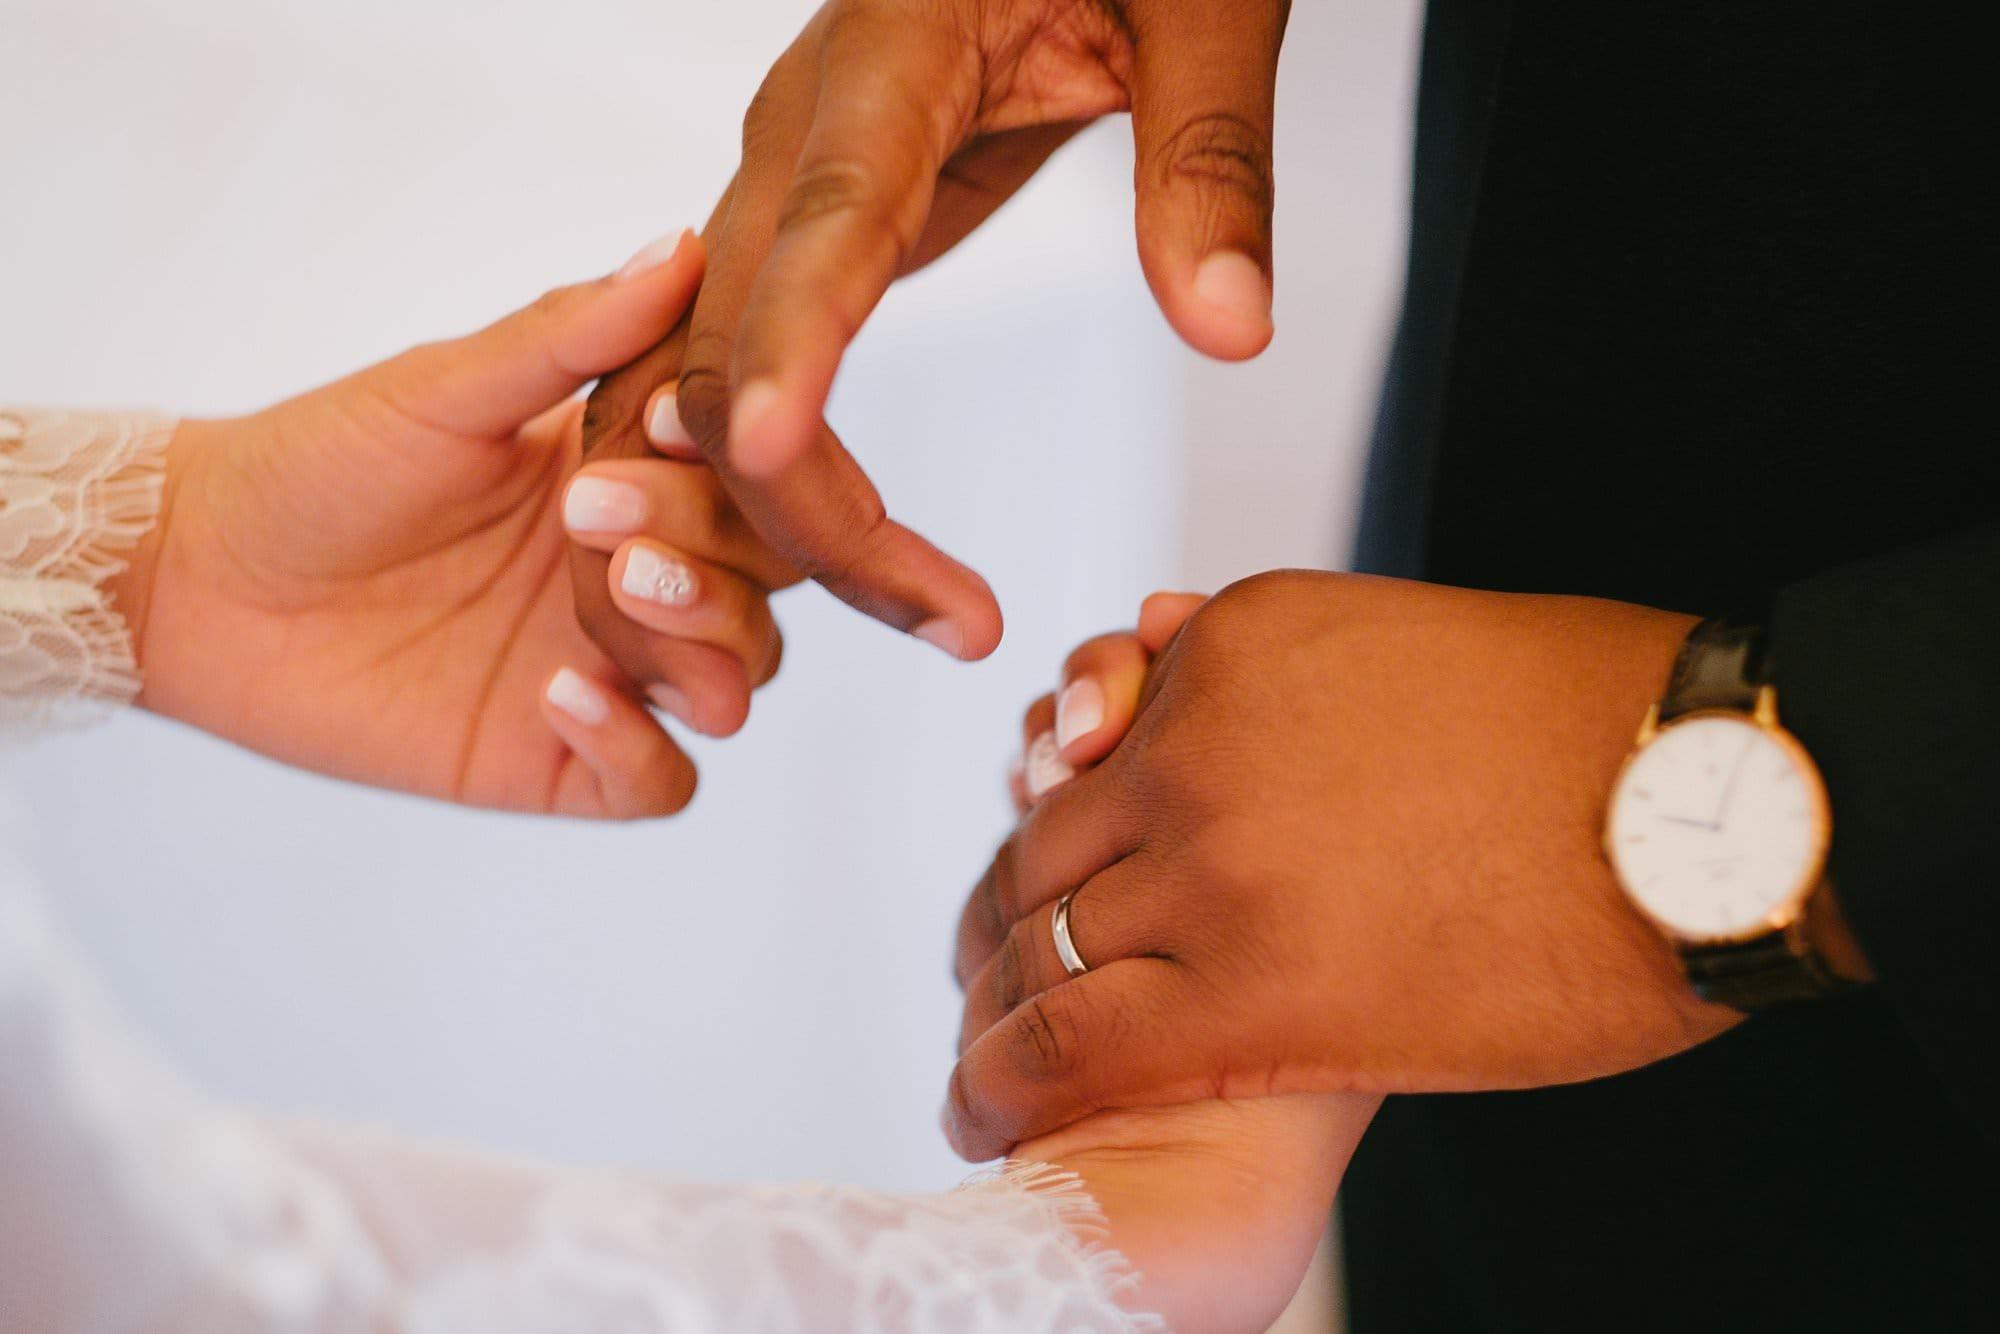 asia house london wedding photographer 028 - Rachel + Gabriel   Asia House Wedding Photography